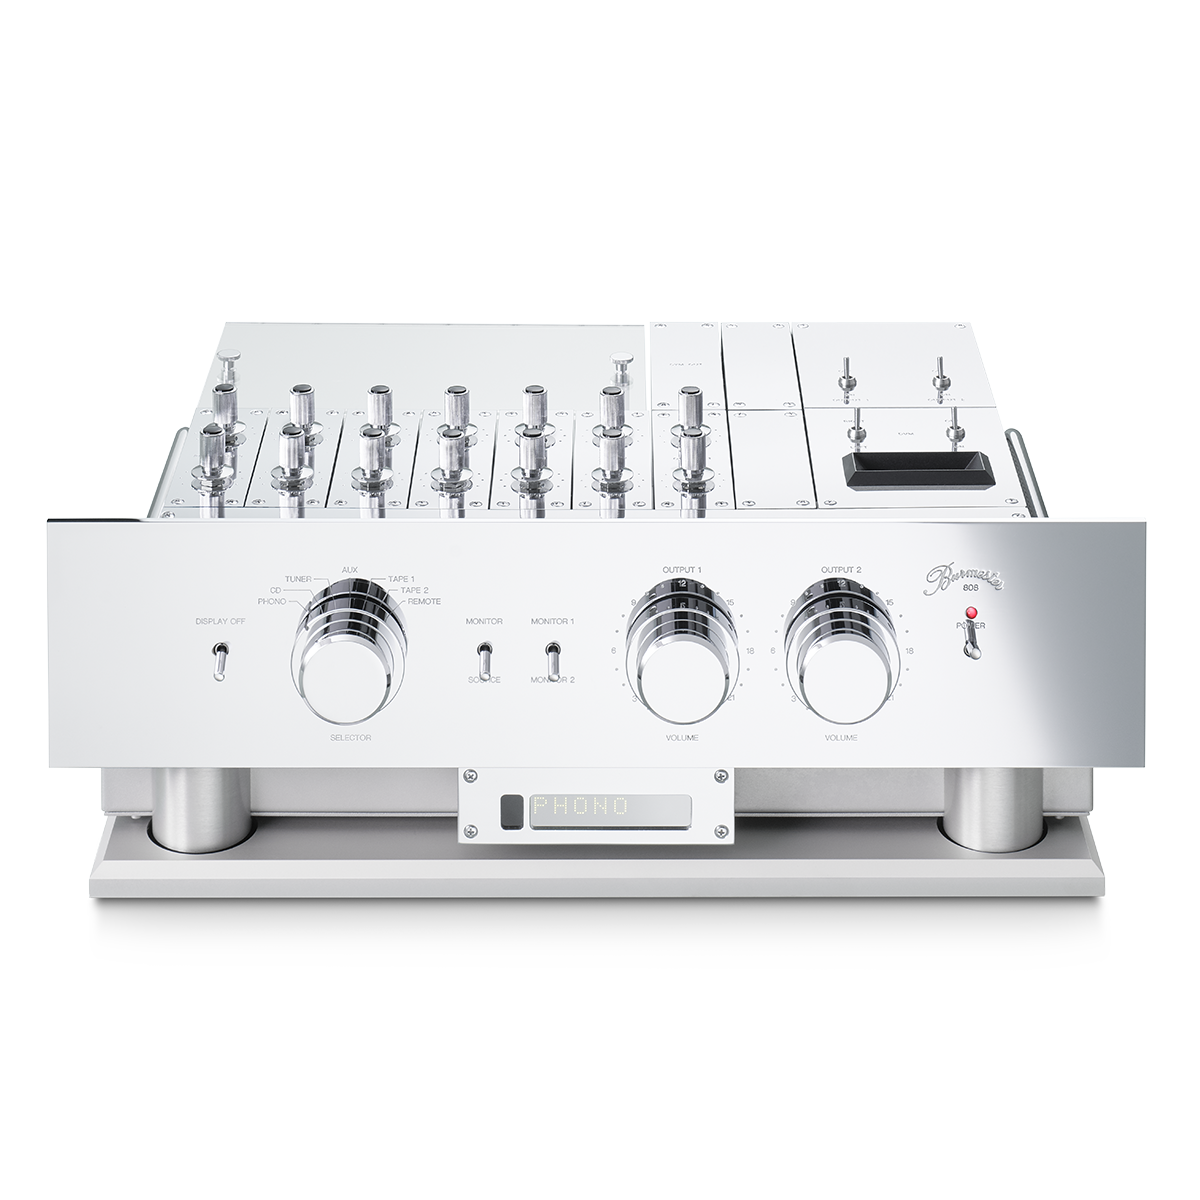 Burmester Reference 808 MK5 Preamplifier